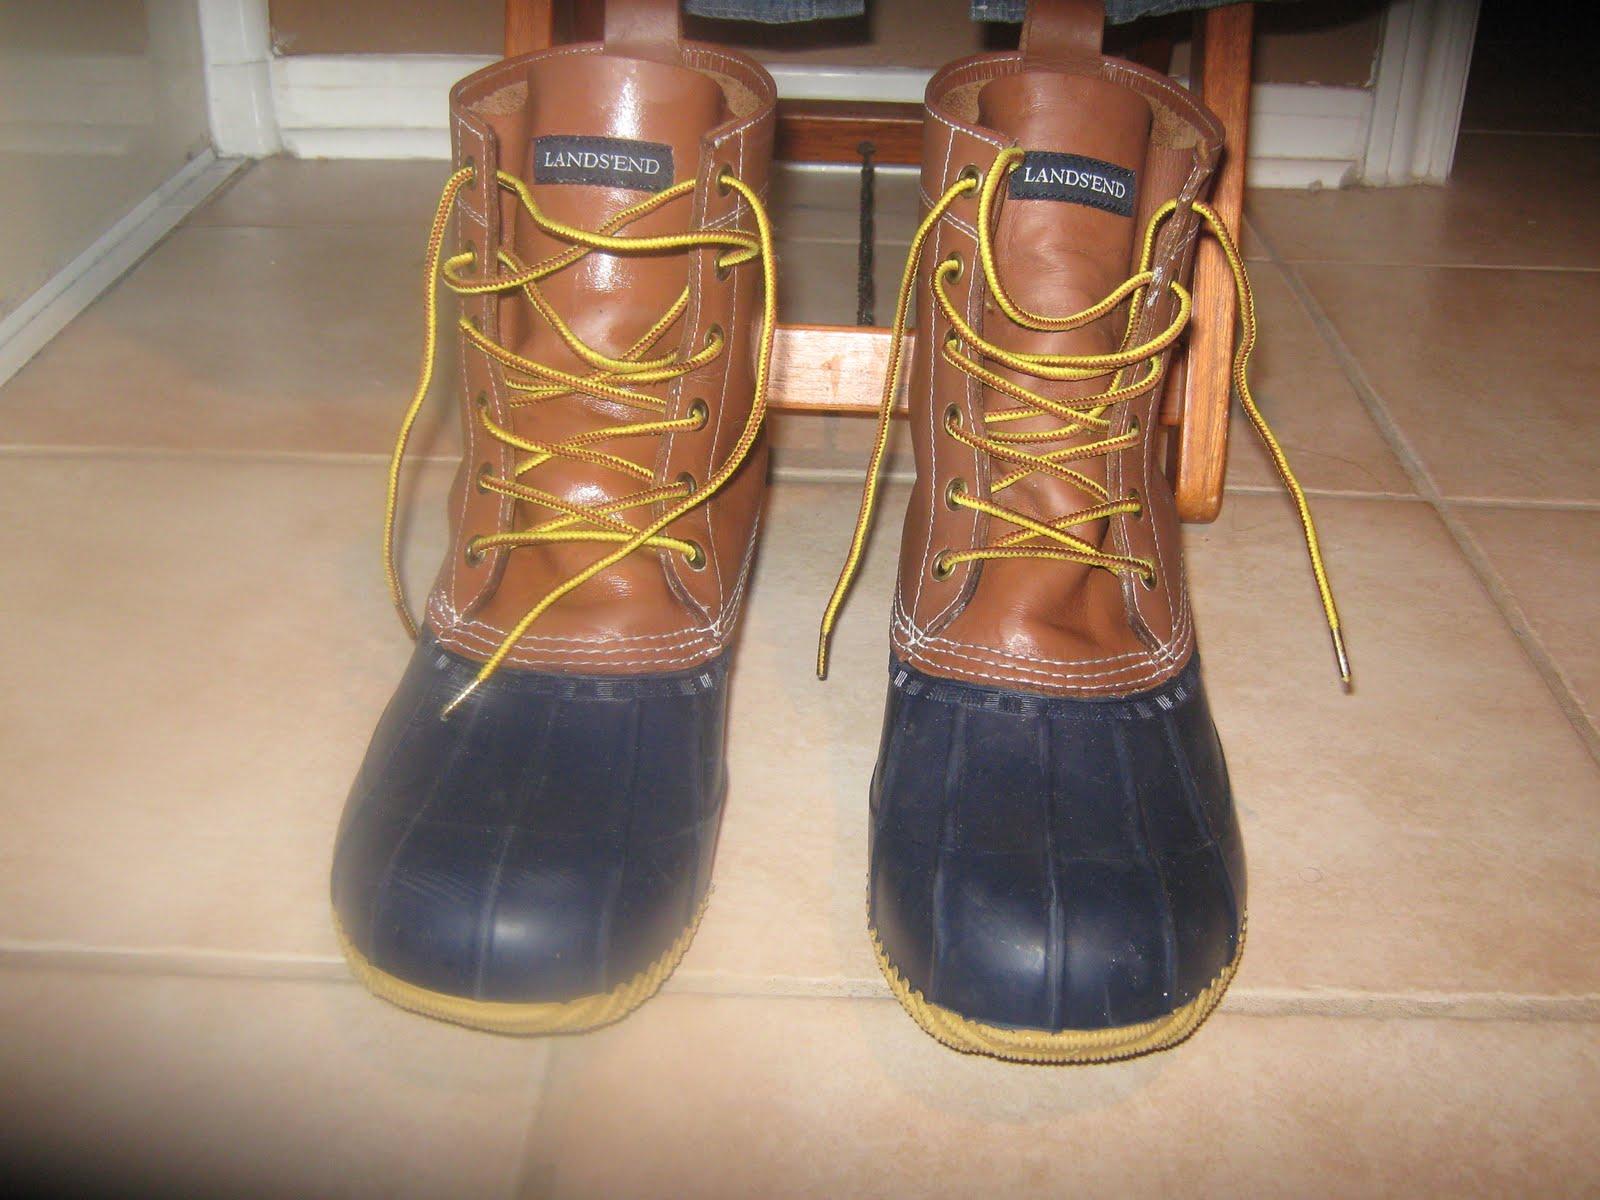 f9c176b93422e Think Mcqueen: Lands' End Canvas duck boots